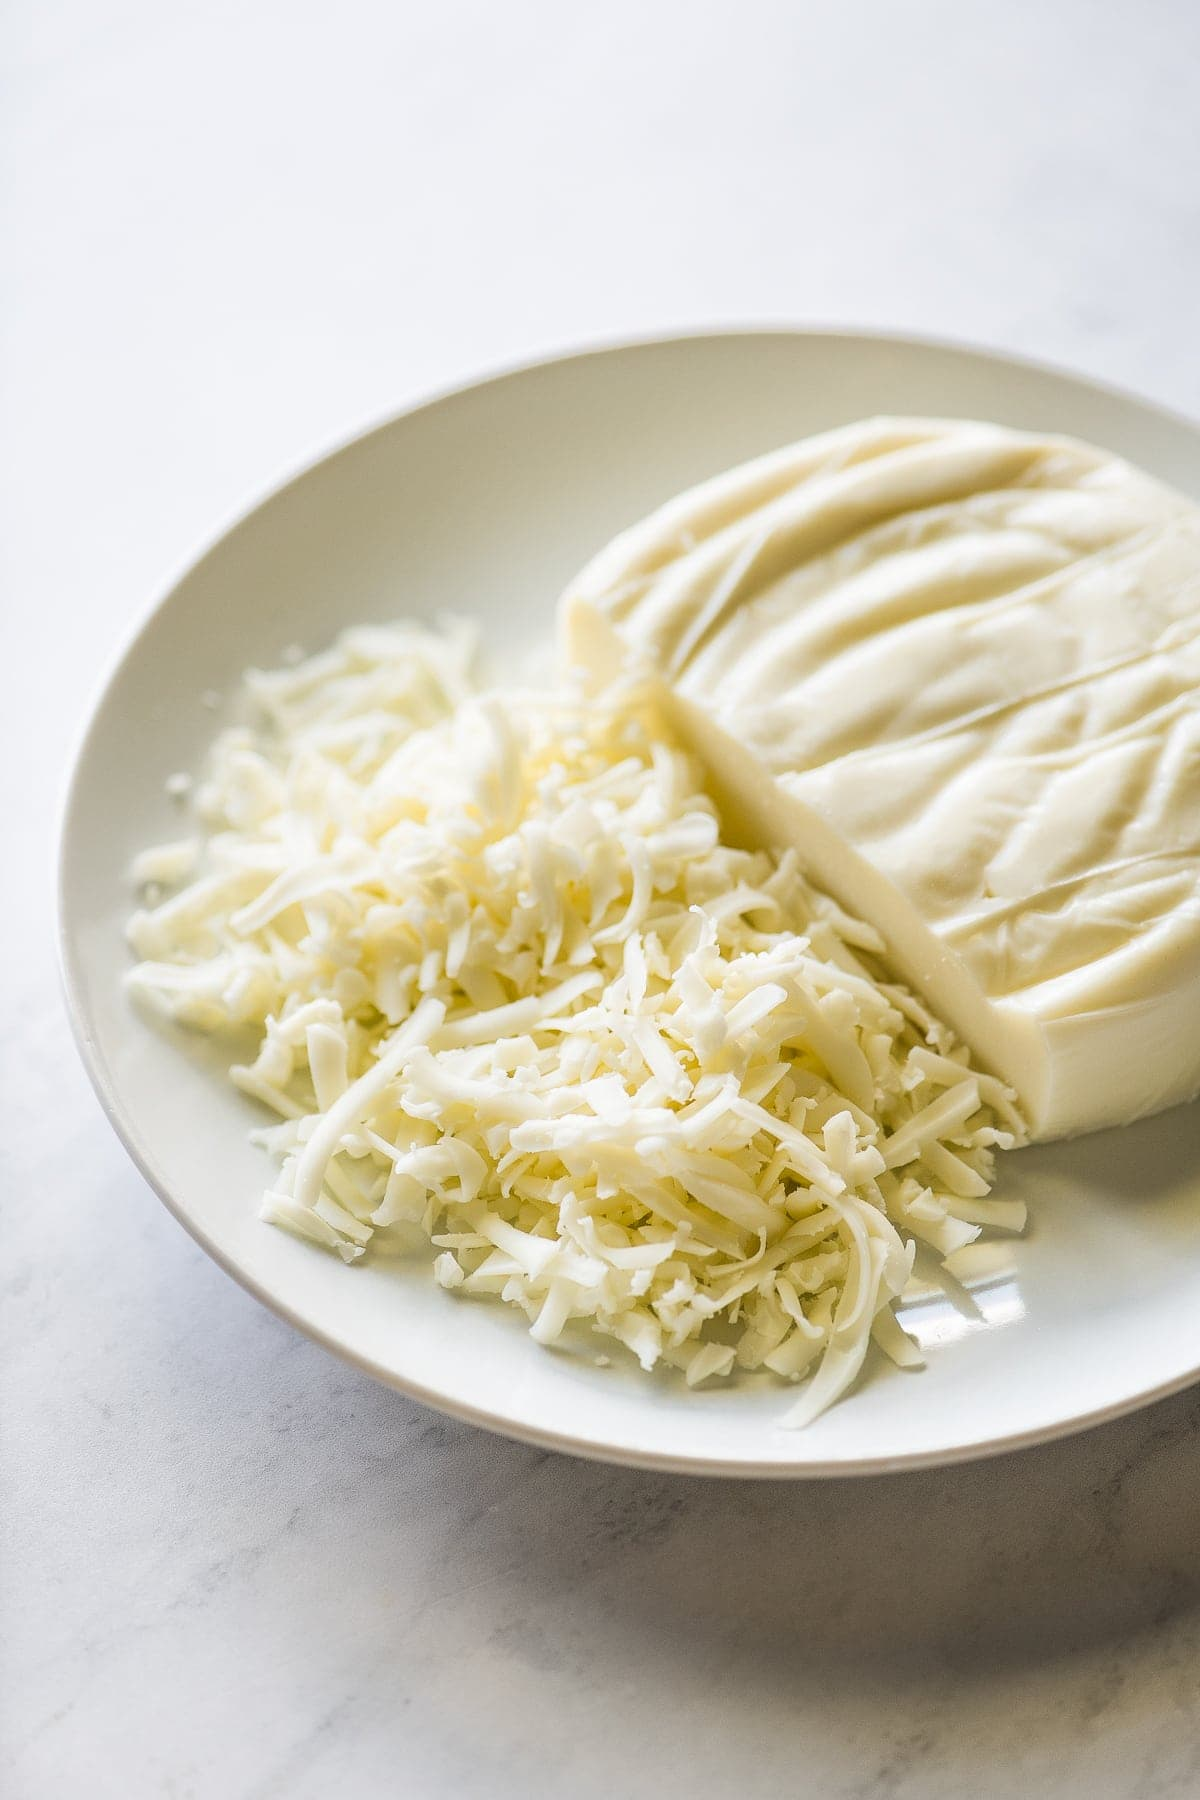 Oaxaca cheese on plate.